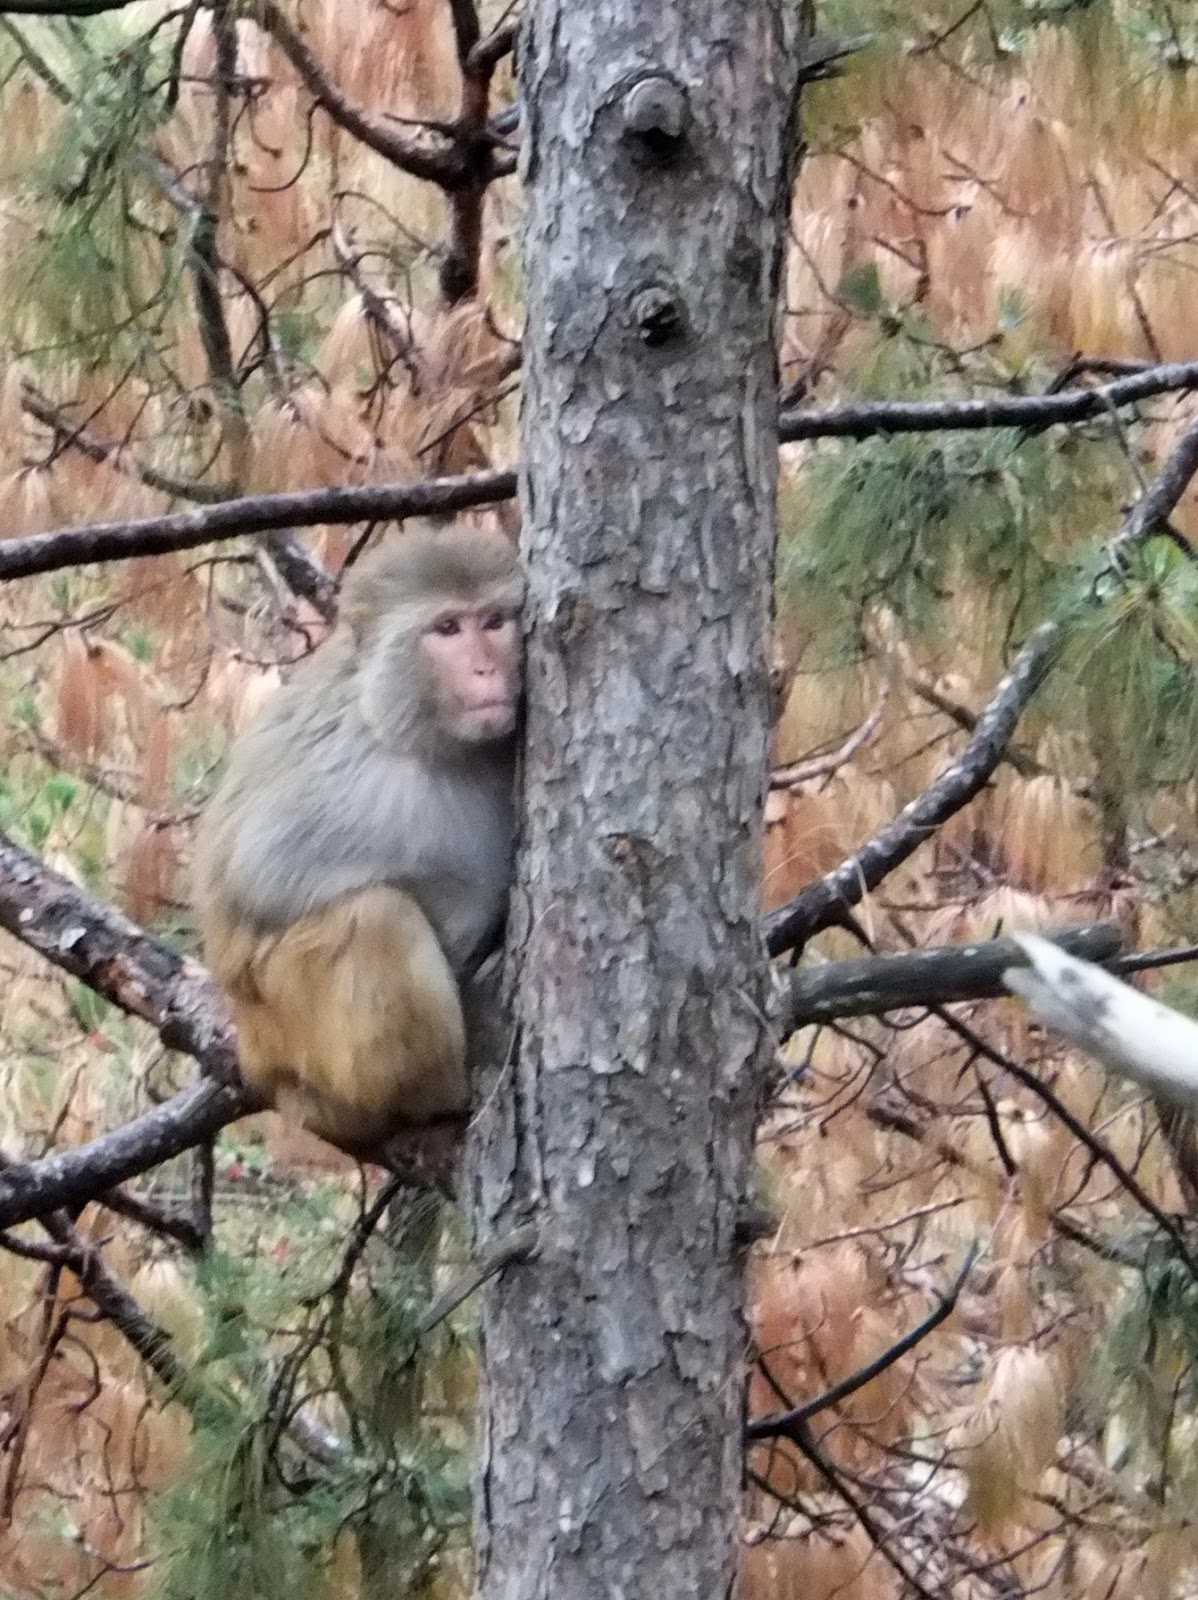 обезьяна готовится ко сну